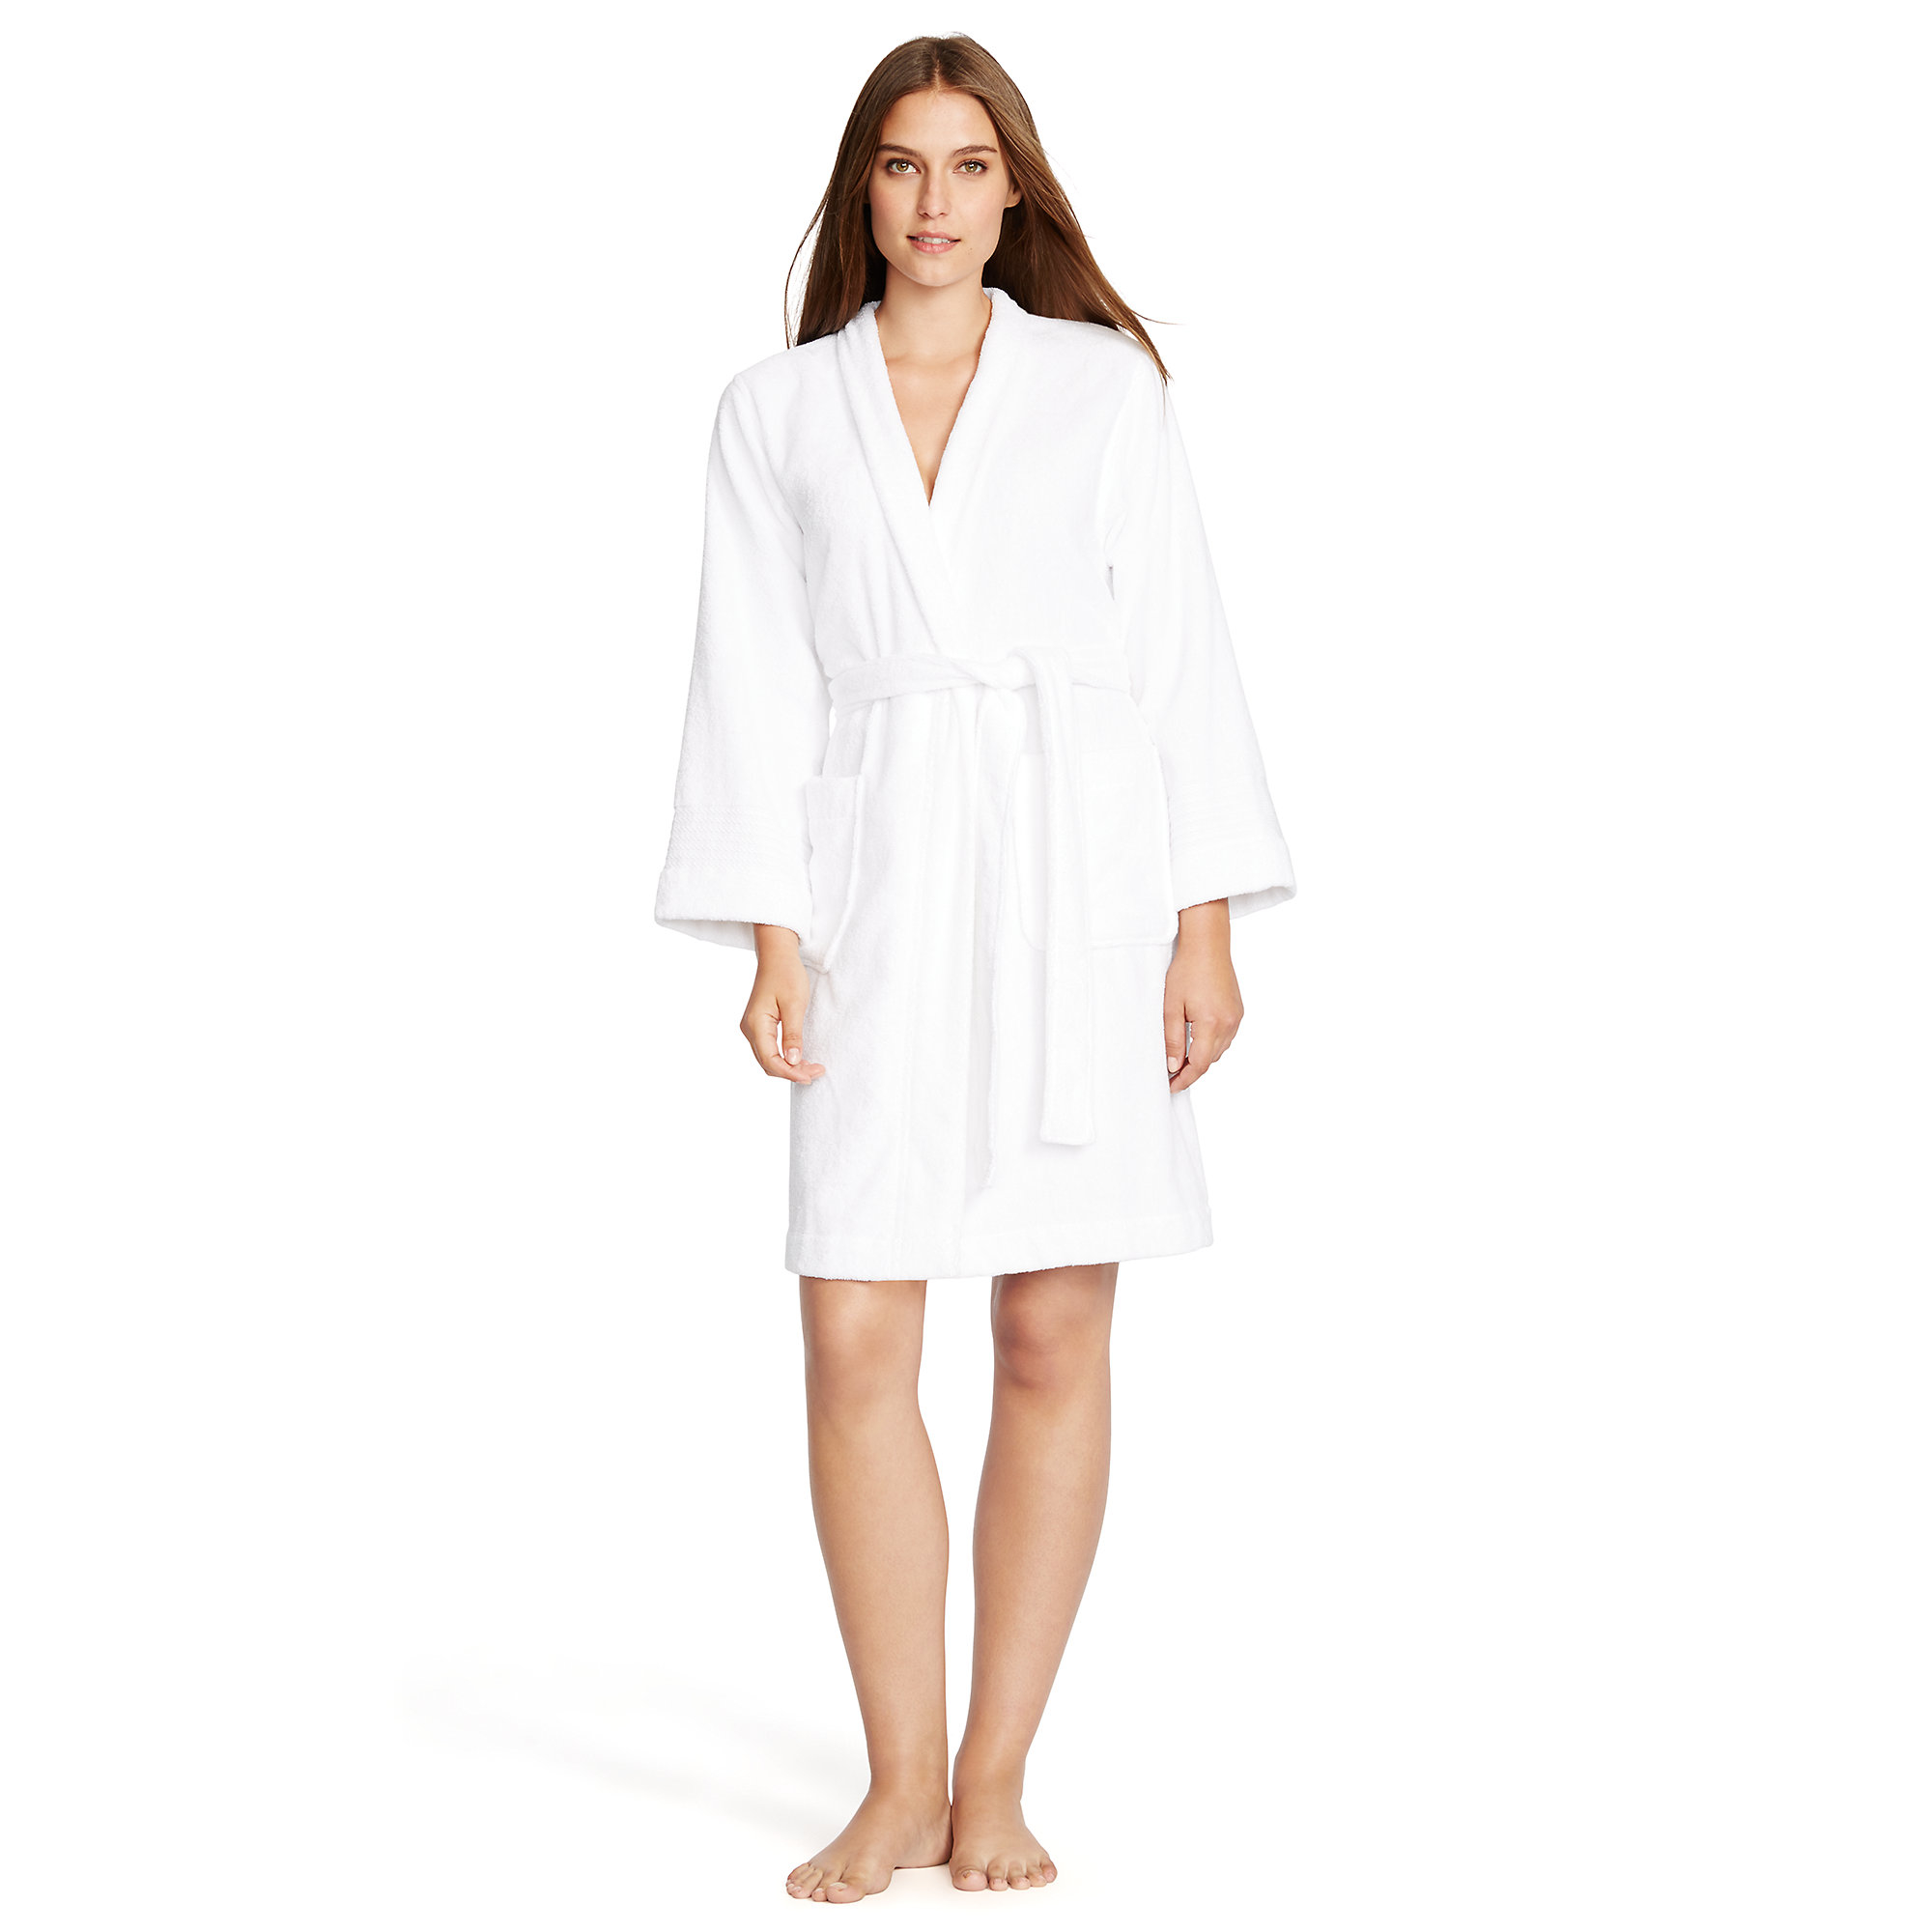 ralph lauren cotton terry robe in white lyst. Black Bedroom Furniture Sets. Home Design Ideas